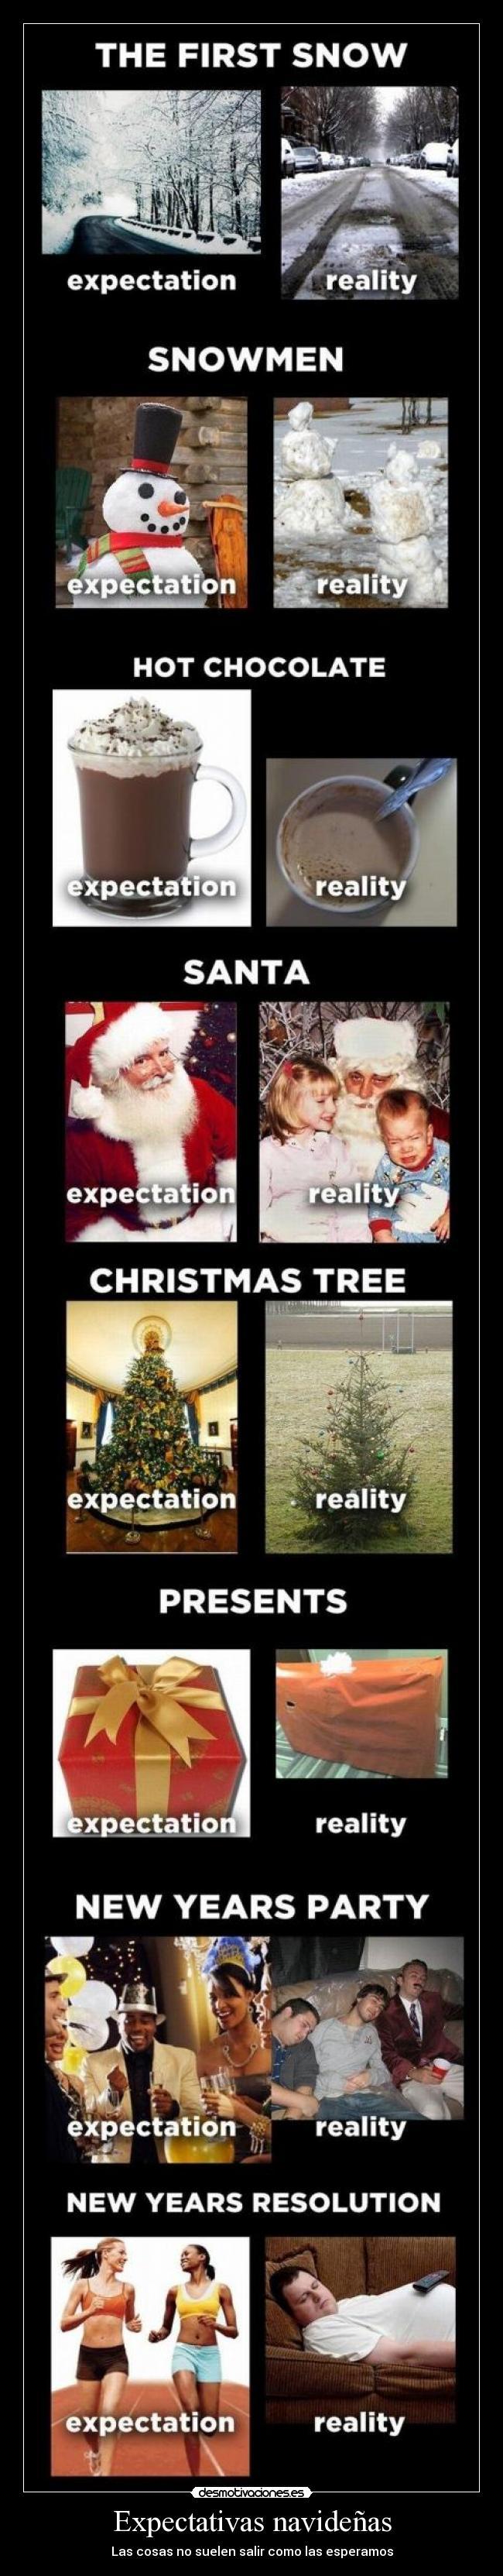 Expectativas-navidenas